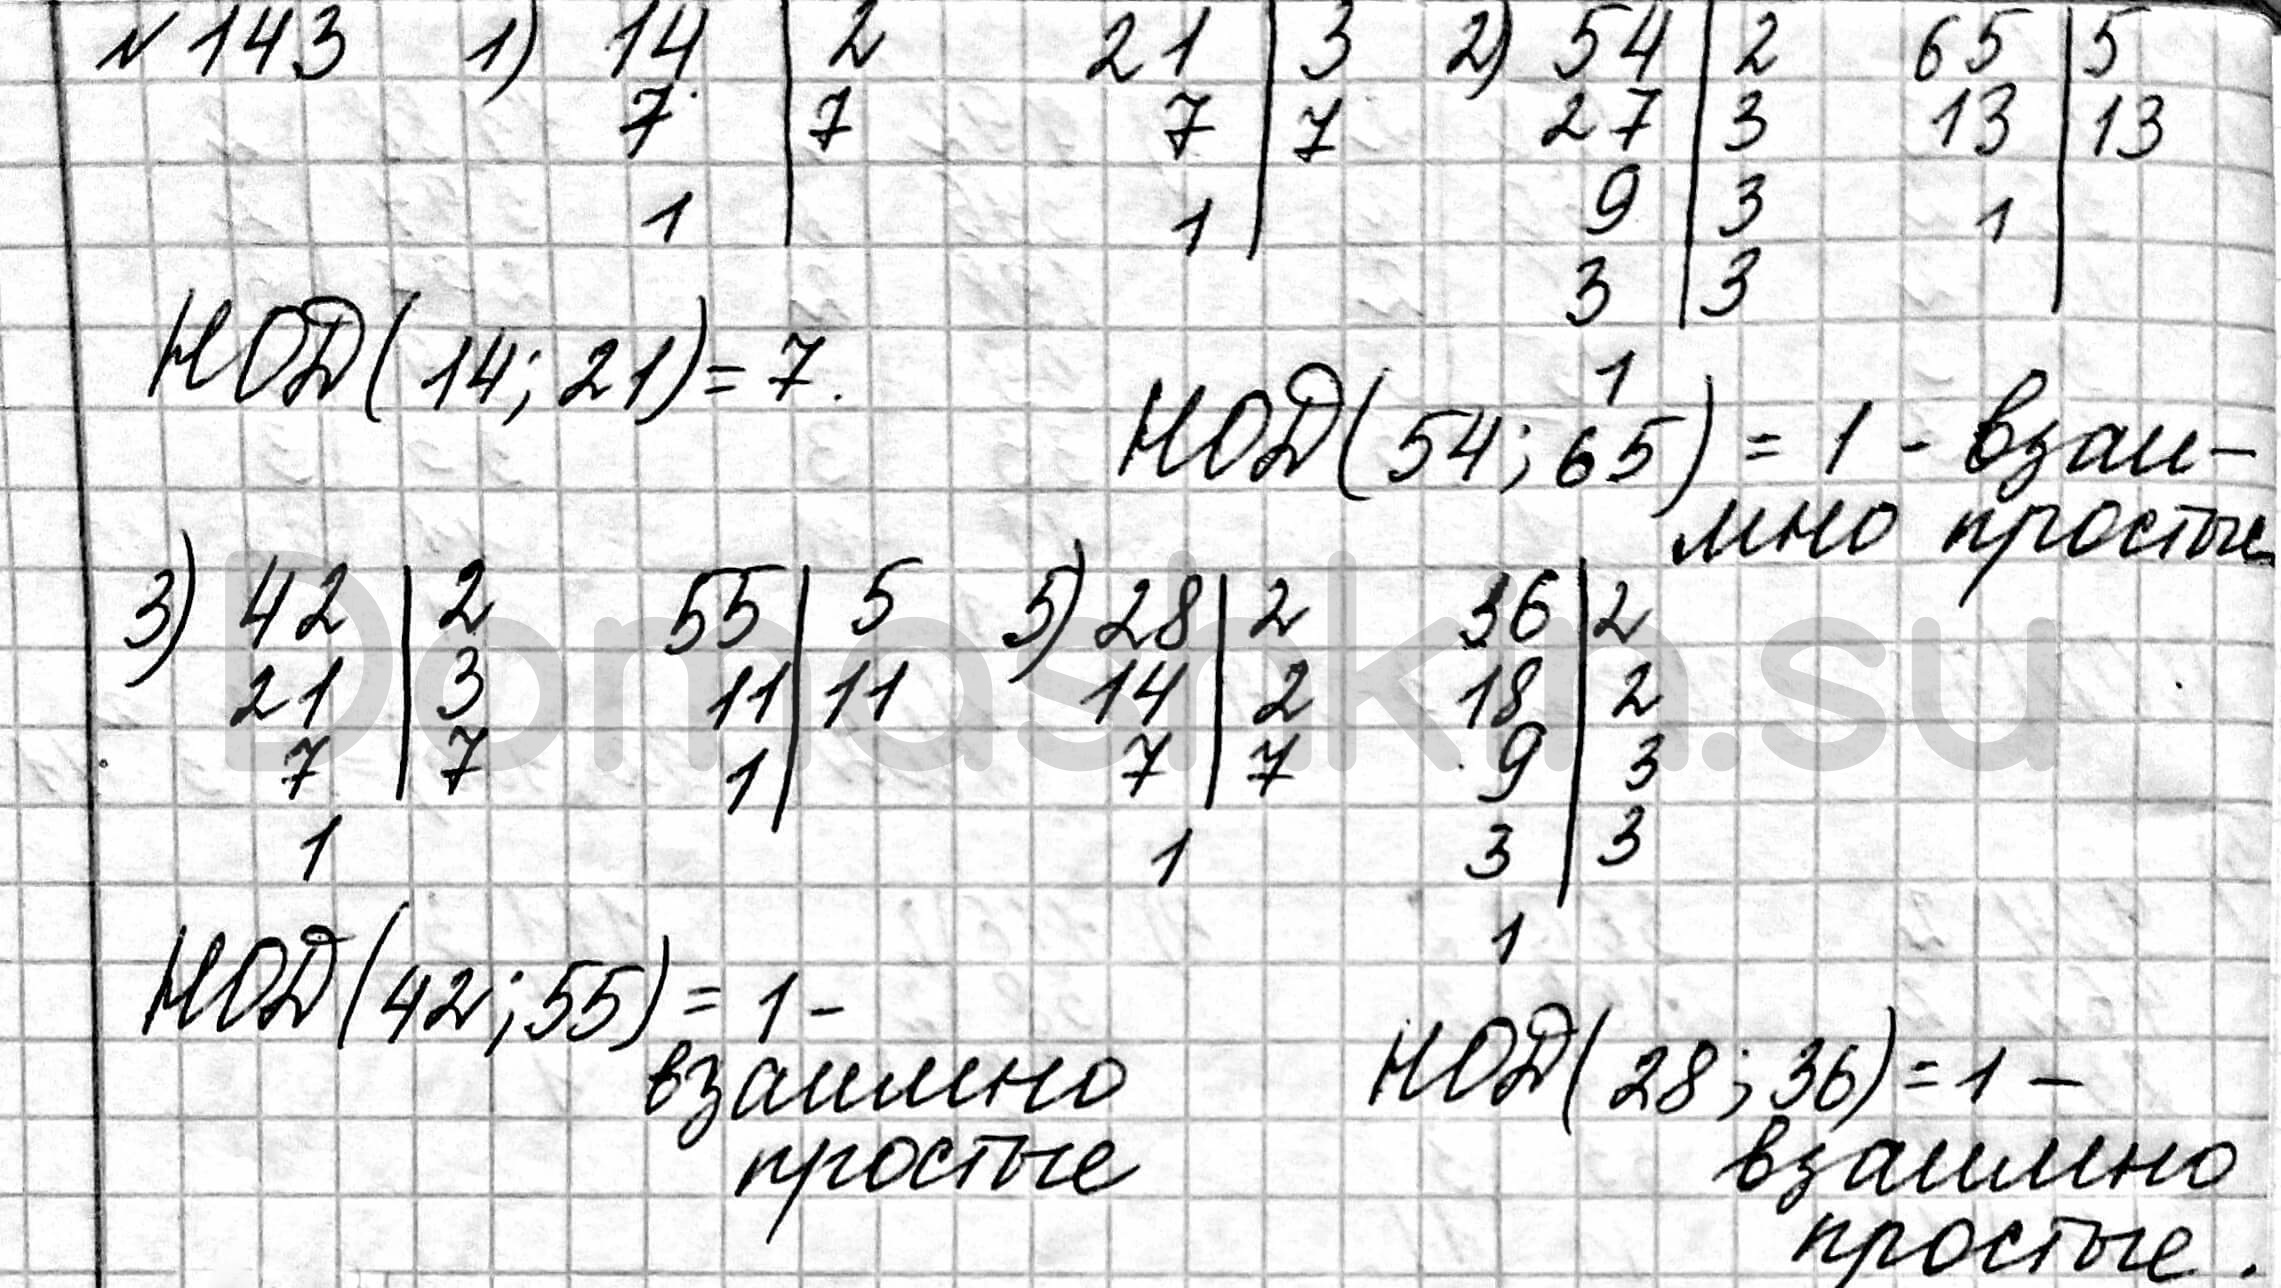 Математика 6 класс учебник Мерзляк номер 143 решение